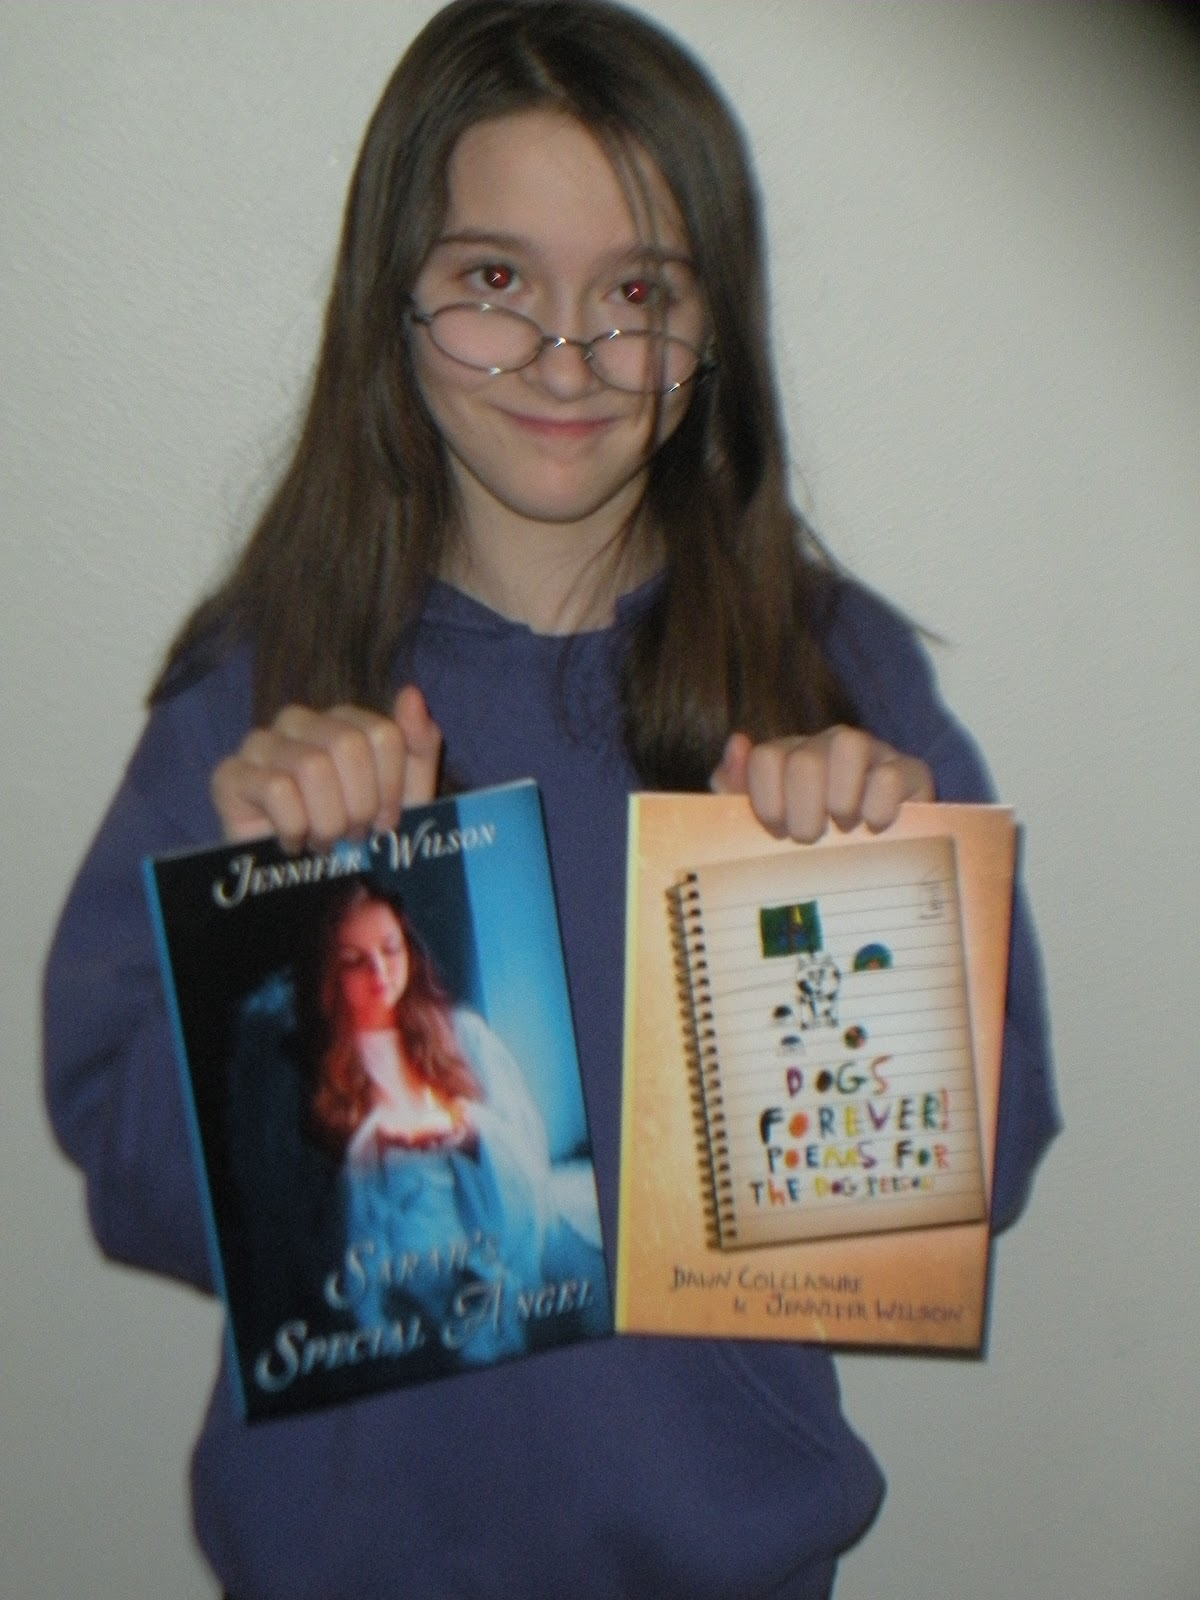 http://3.bp.blogspot.com/-554RtDU_Ue0/UOEKu_8ioNI/AAAAAAAABhc/ZZDxV795IfE/s1600/Jen+with+her+books+2012.JPG